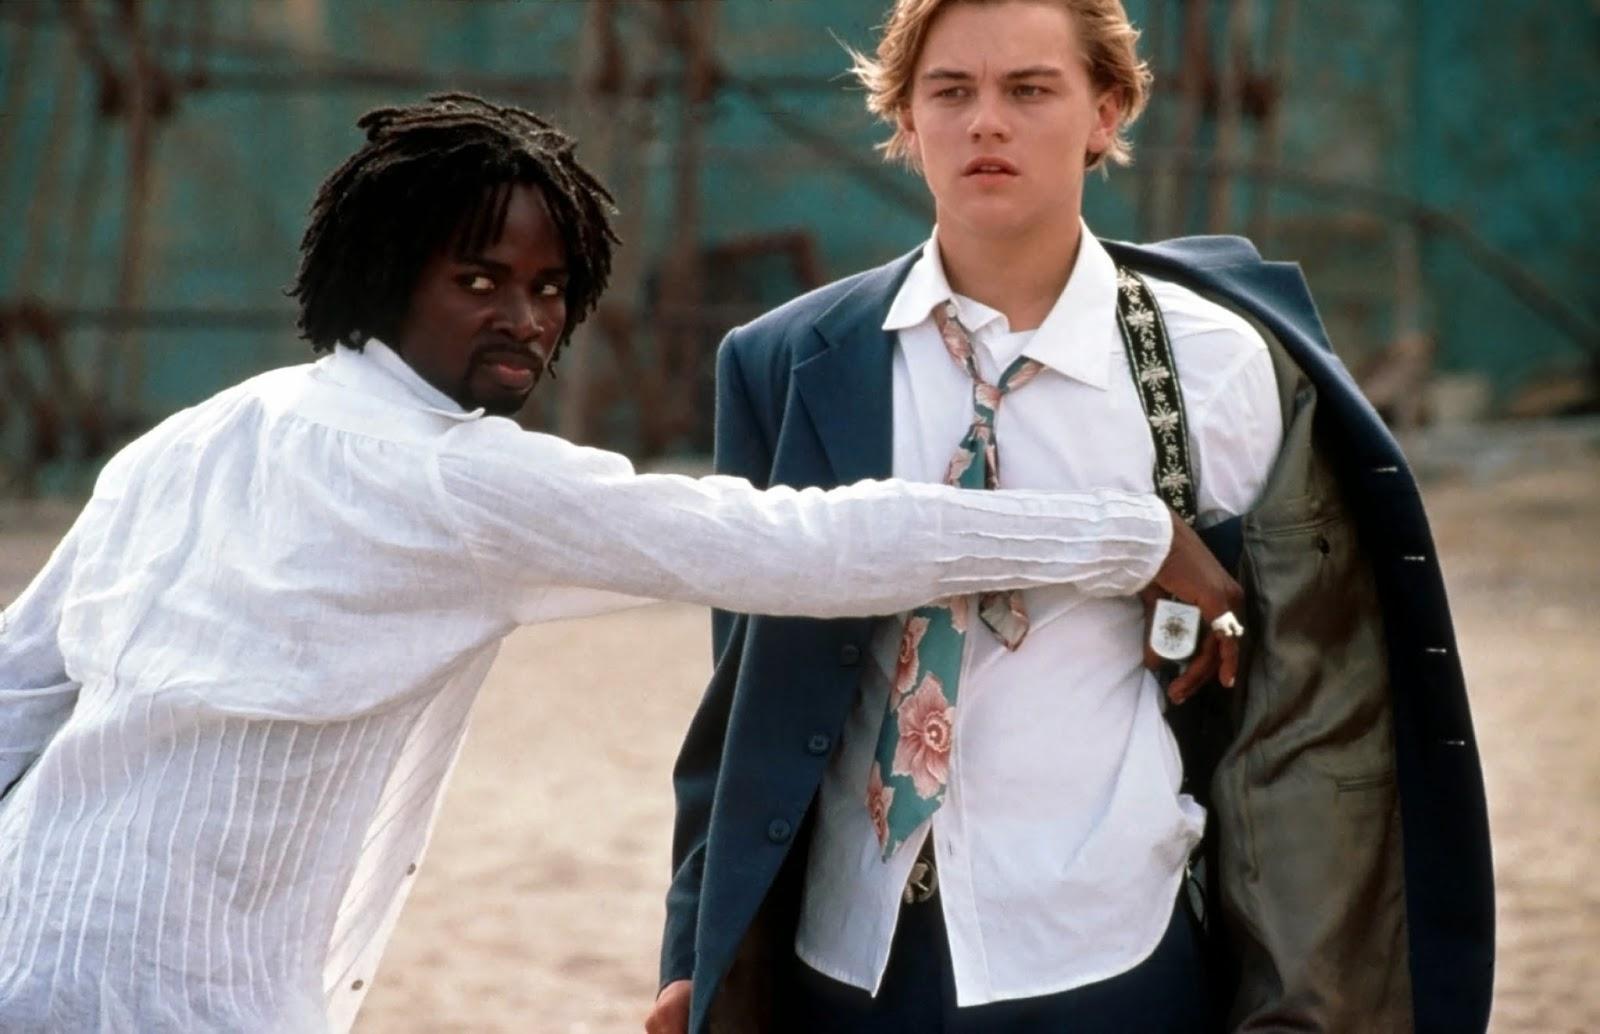 Leonardo DiCaprio as Romeo wears a necktie